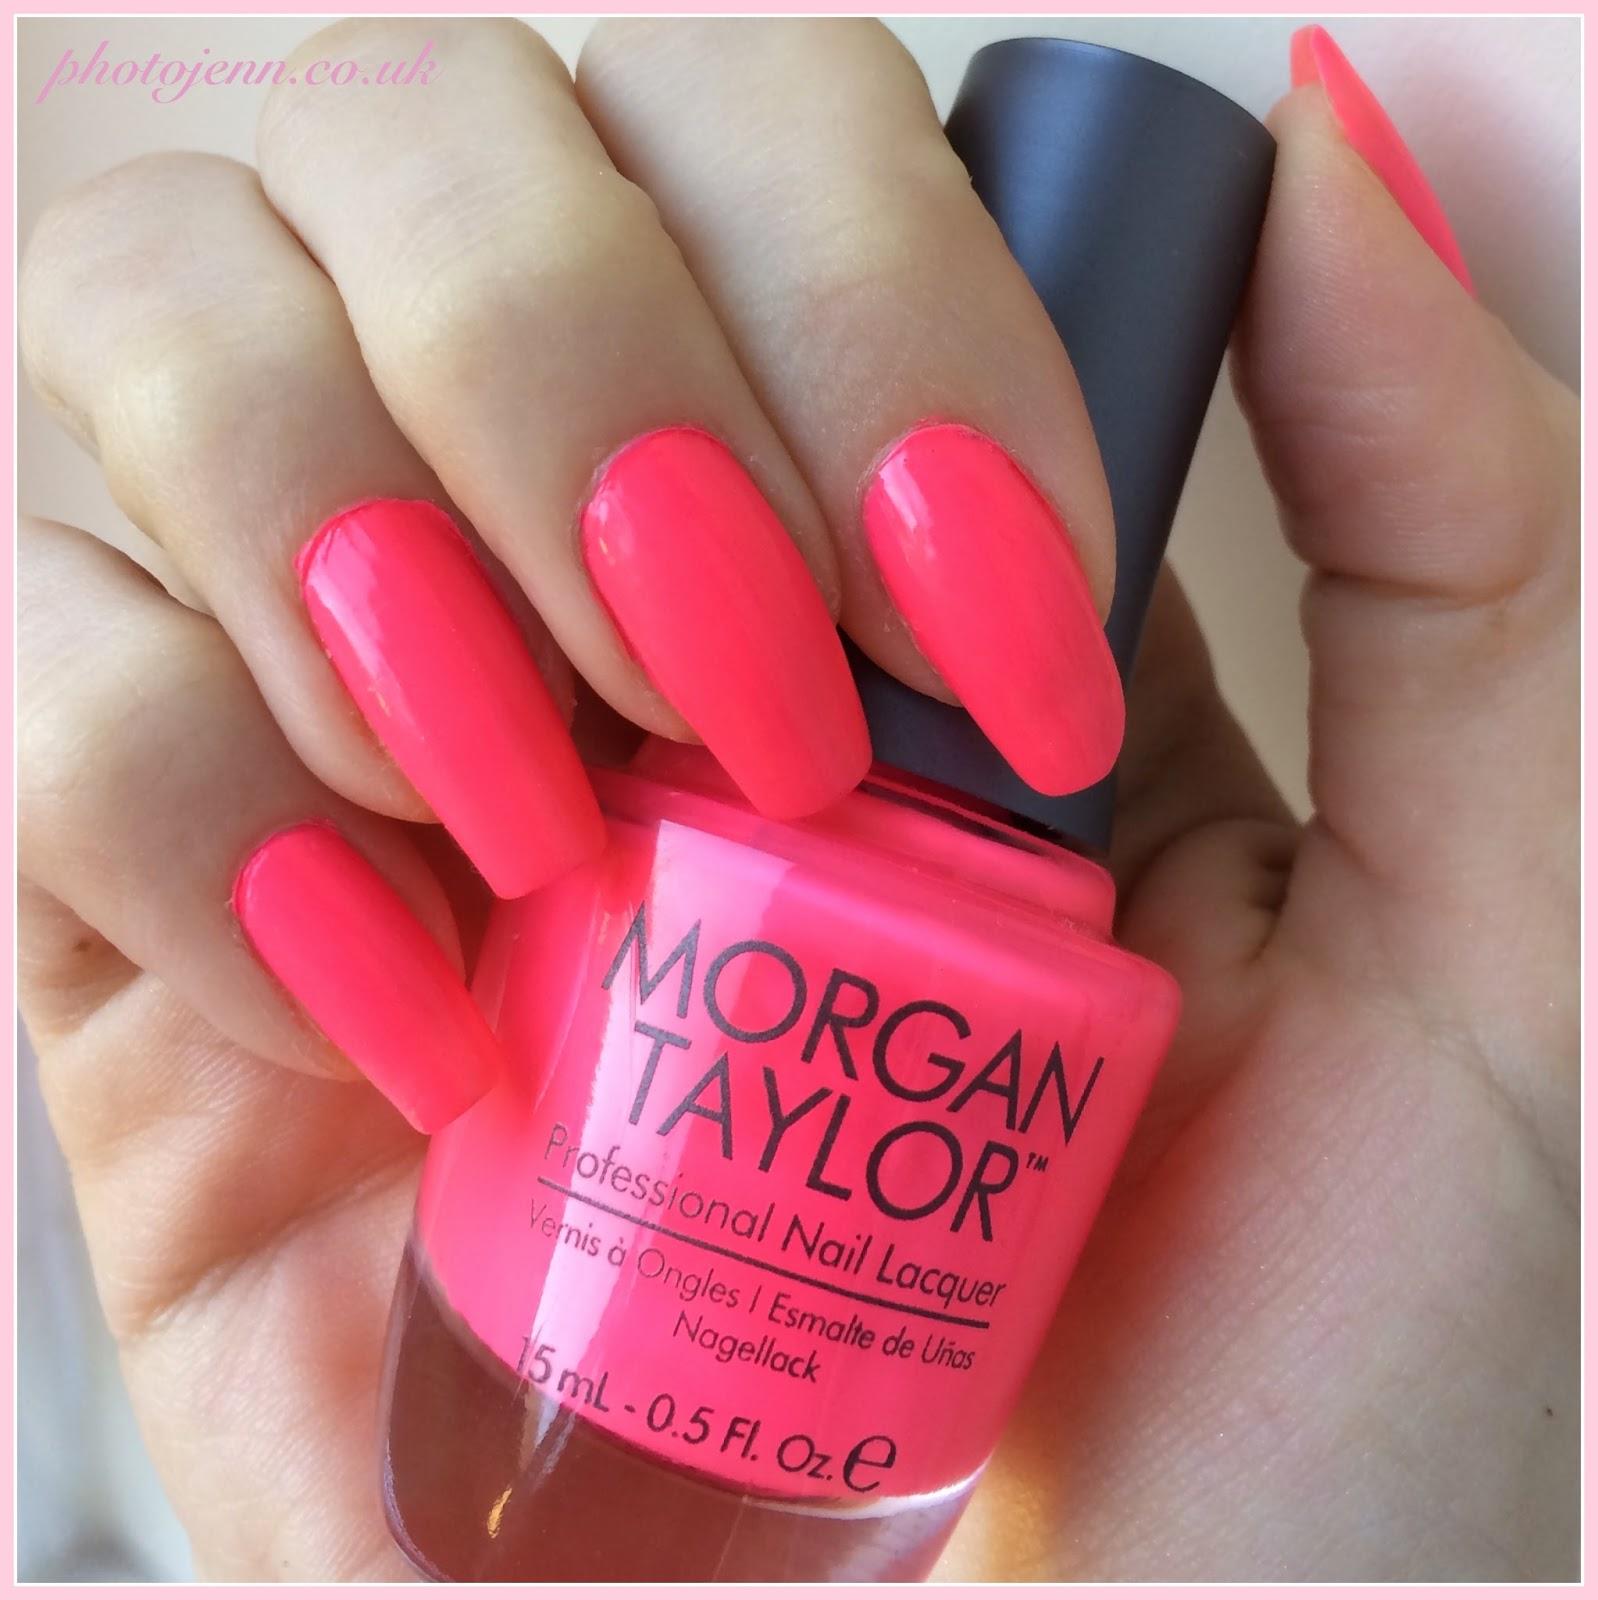 coloristiq-morgan-taylor-pink-flame-ingo-swatch